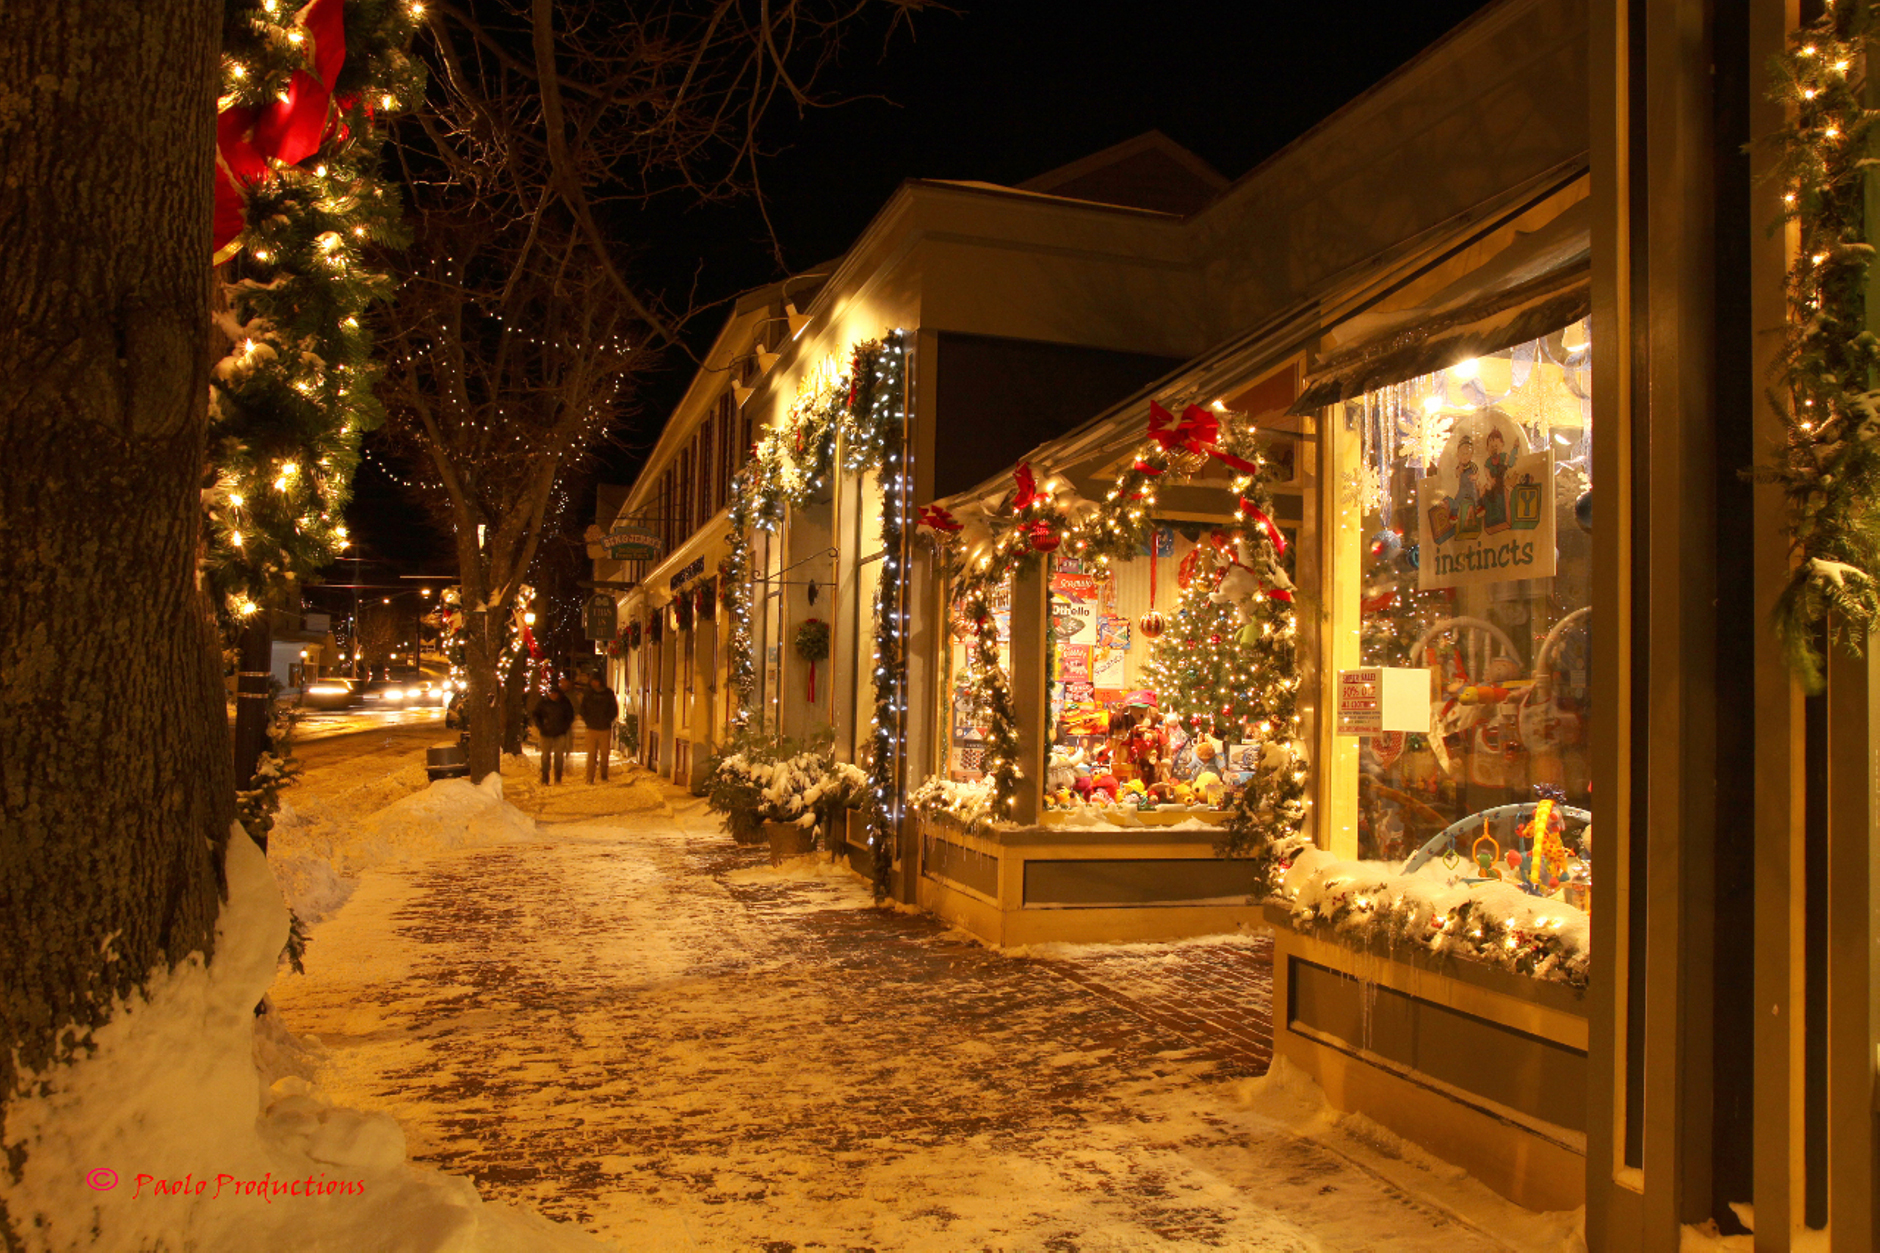 Design Love Fest Fall Wallpaper Towns With The Most Christmas Spirit Vagabond Summer